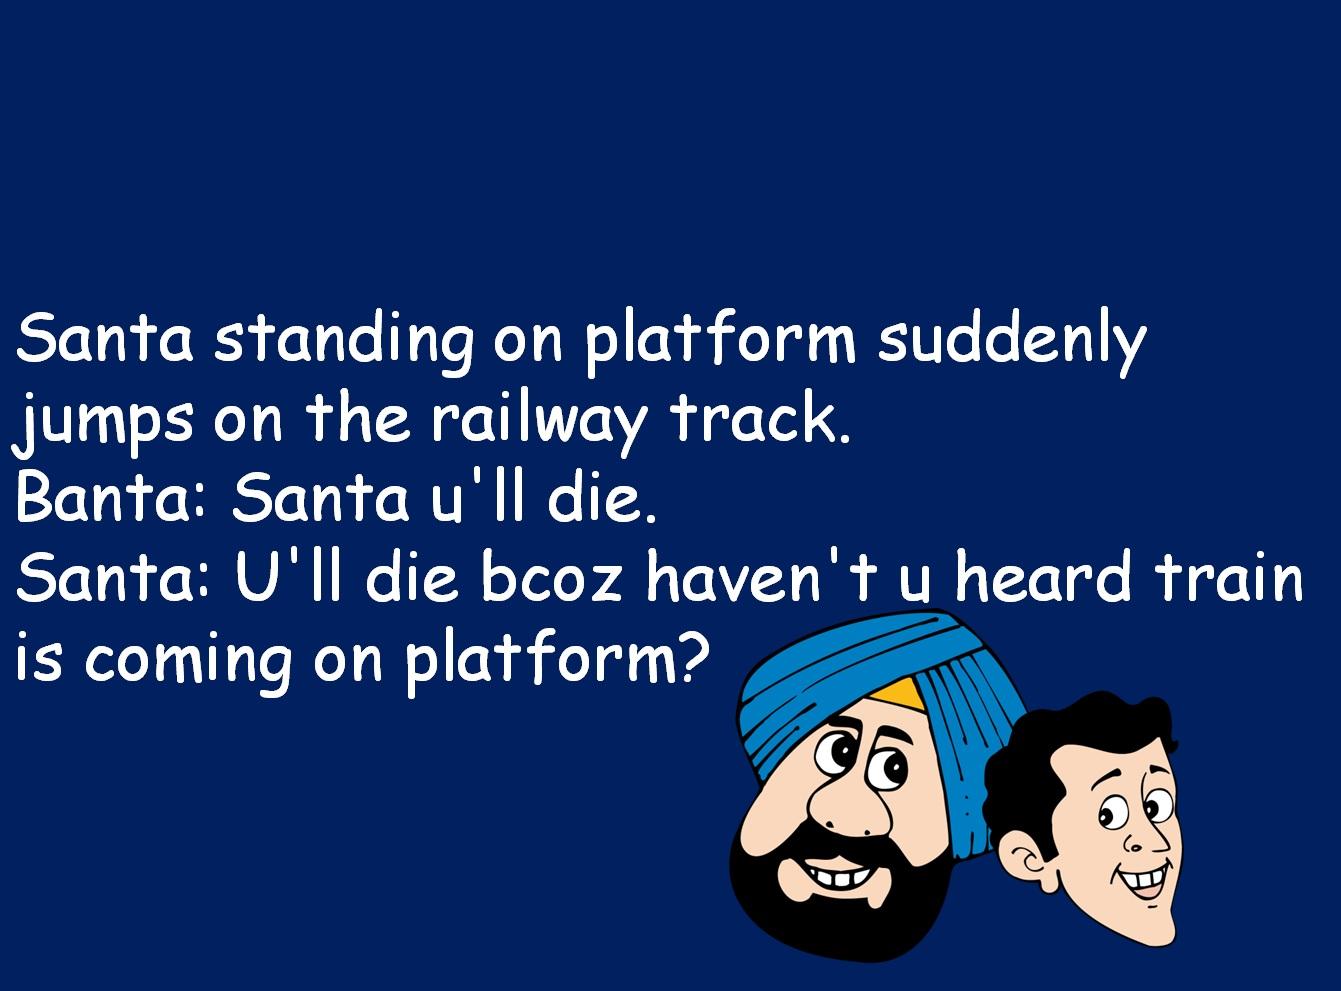 Santa standing on platform suddenly jumps on the railway track. Banta: Santa u'll die. Santa: U'll die bcoz haven't u heard train is coming on platform